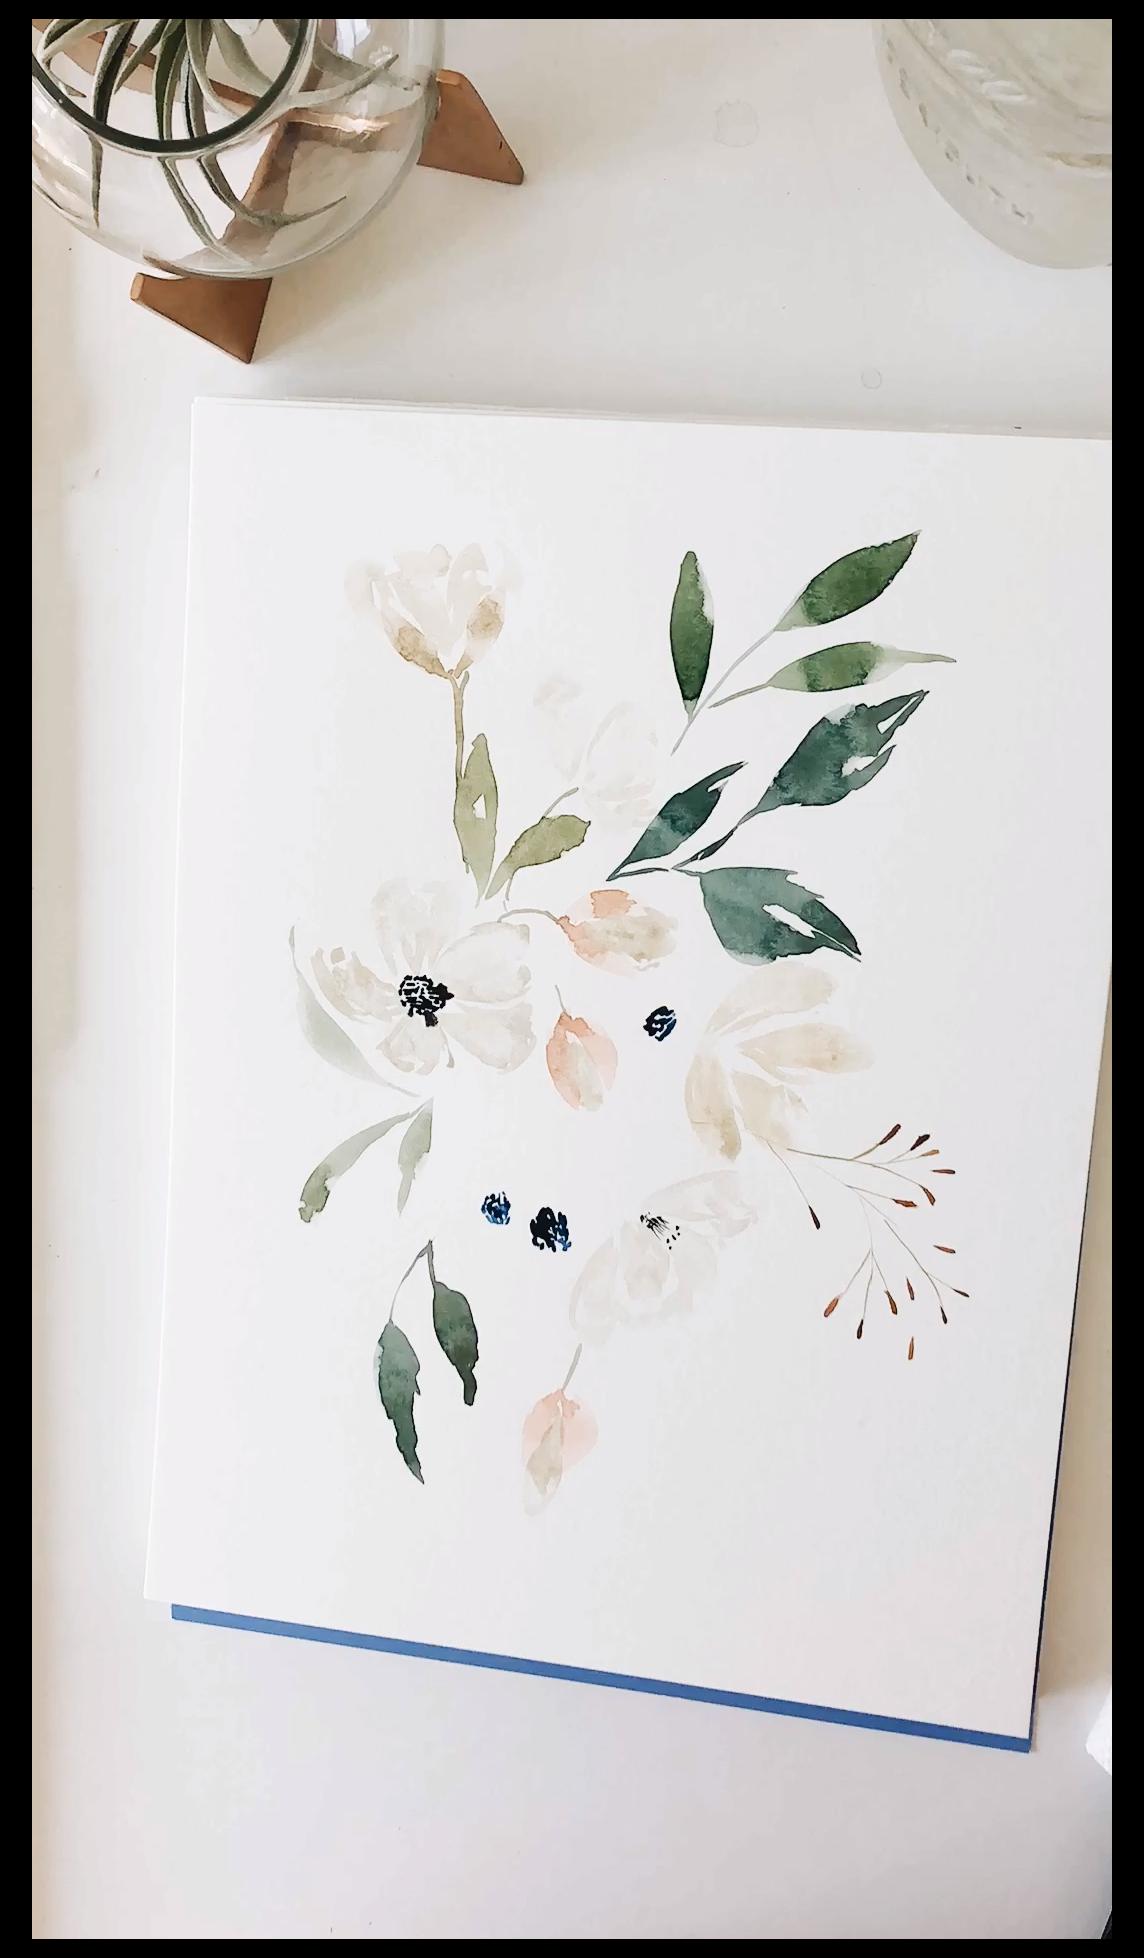 500 Watercolors Ideas In 2021 Watercolor Art Watercolor Paintings Watercolour Inspiration